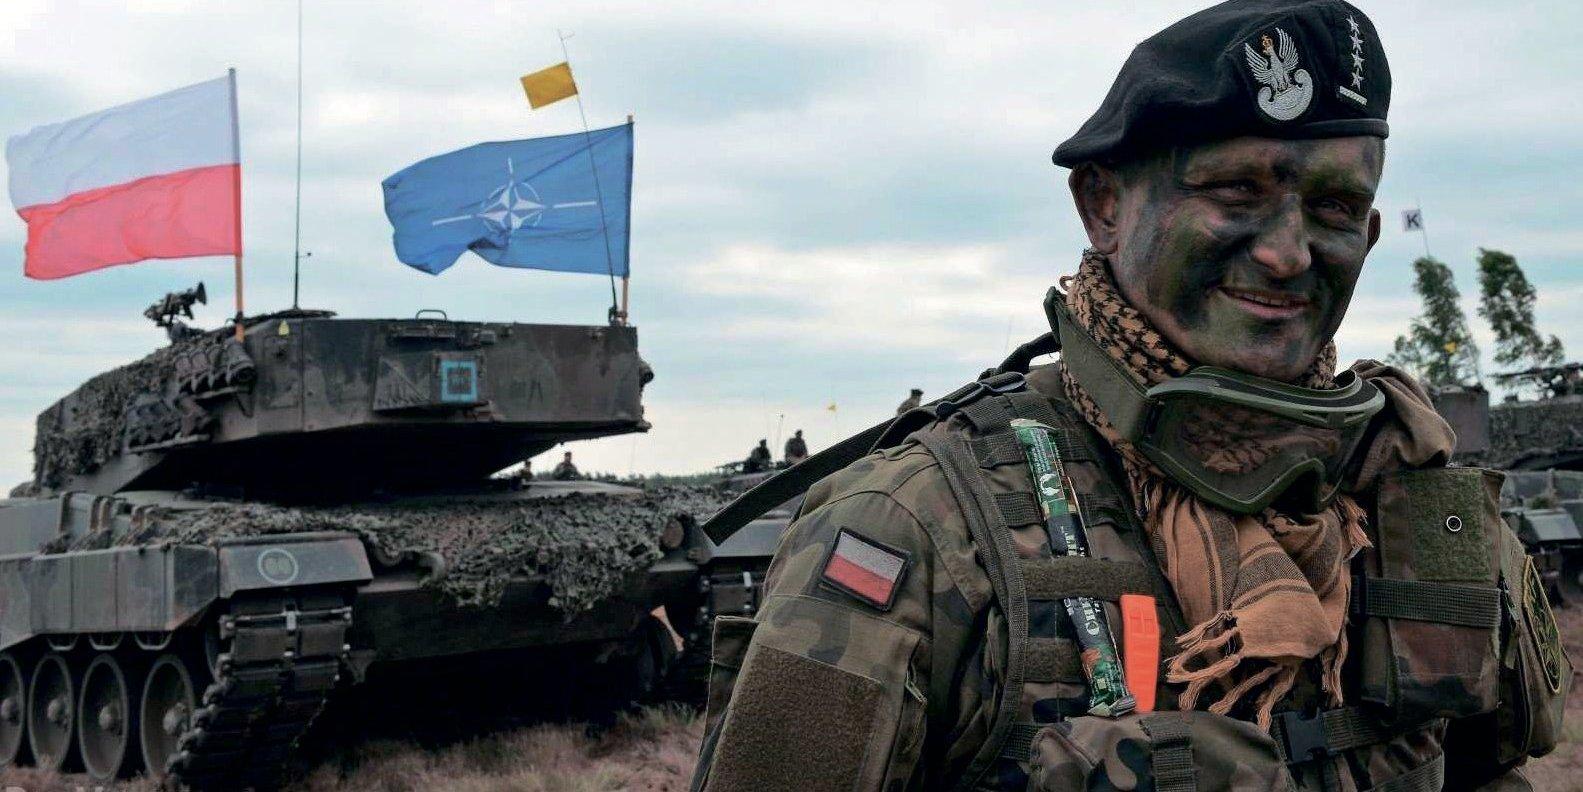 Polacco incontri UE